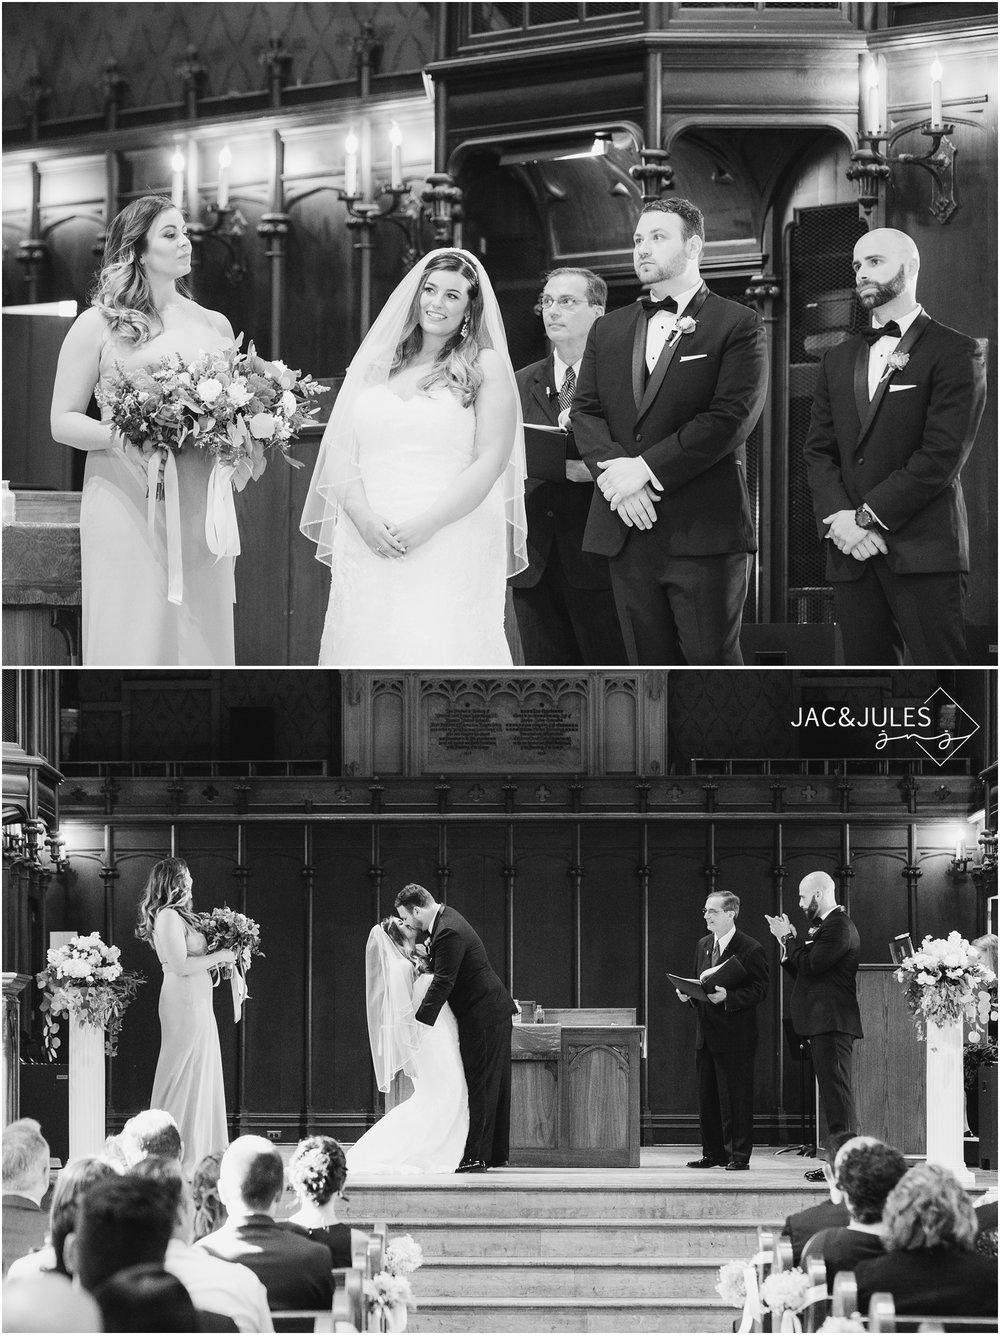 Wedding Ceremony photos at Kirkpatrick Chapel on Rutgers Newbrunswick Campus.